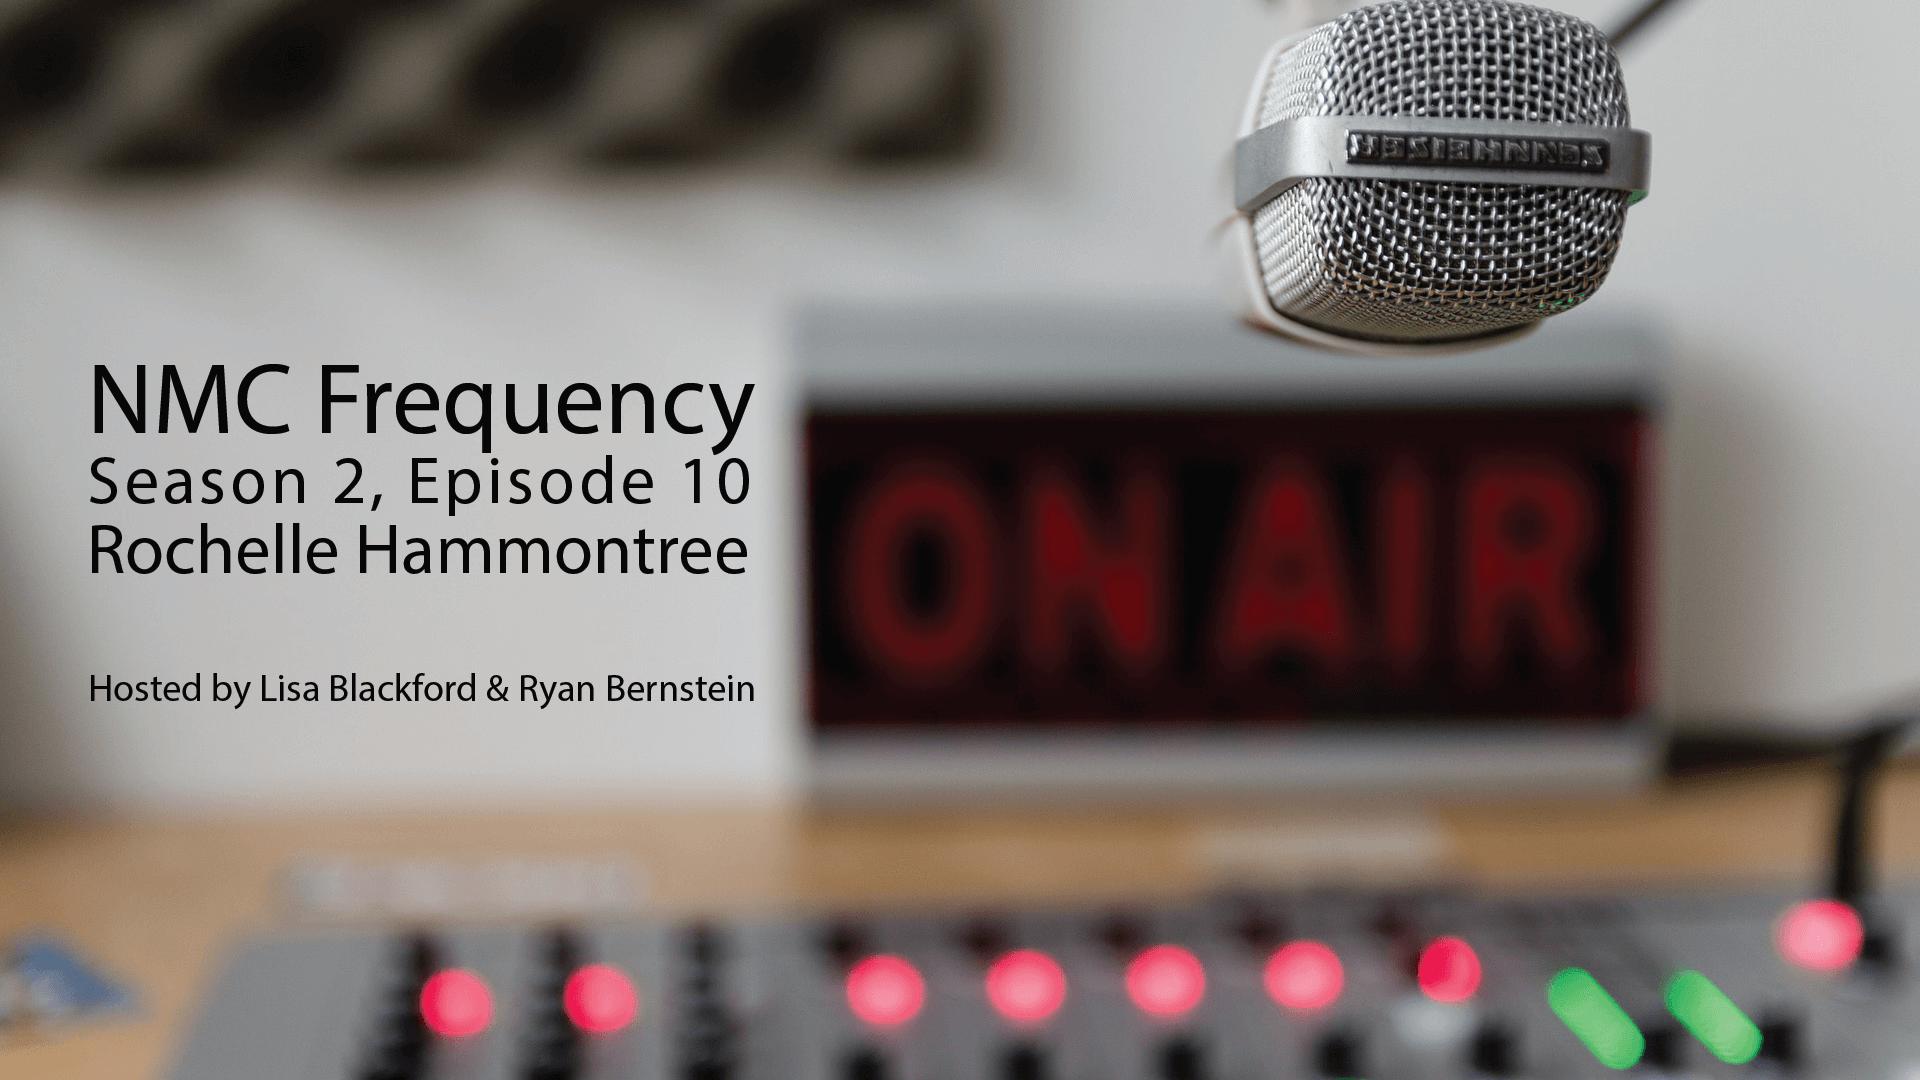 NMC Frequency: Season 2, Episode 10: Rochelle Hammontree